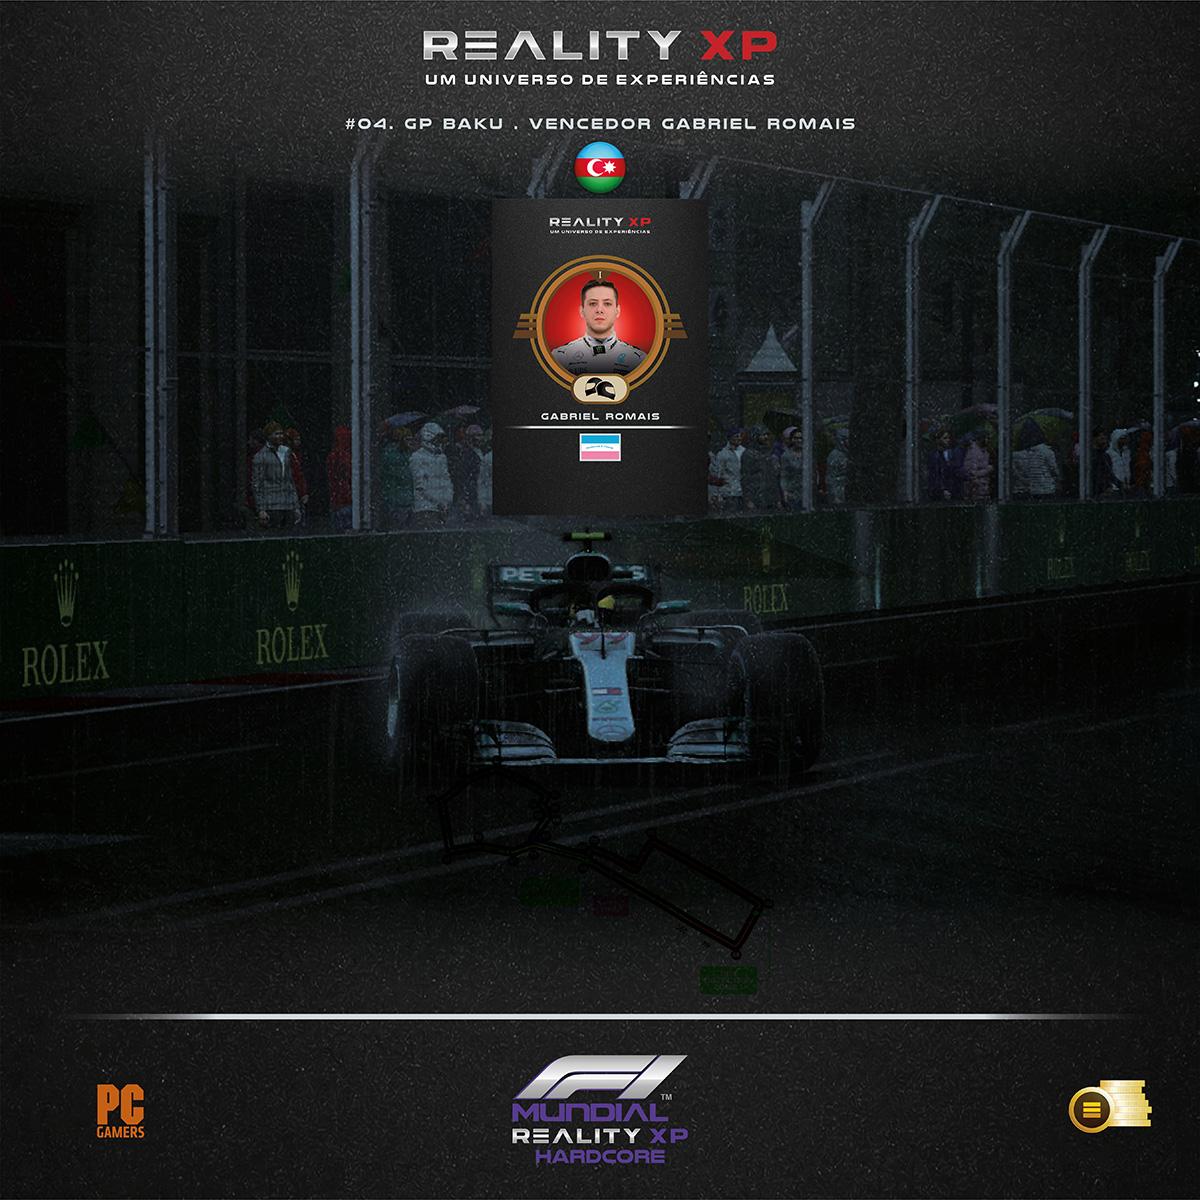 RealityXP_Mundial_RS_PC_HARDCORE_ETAPA_4_2